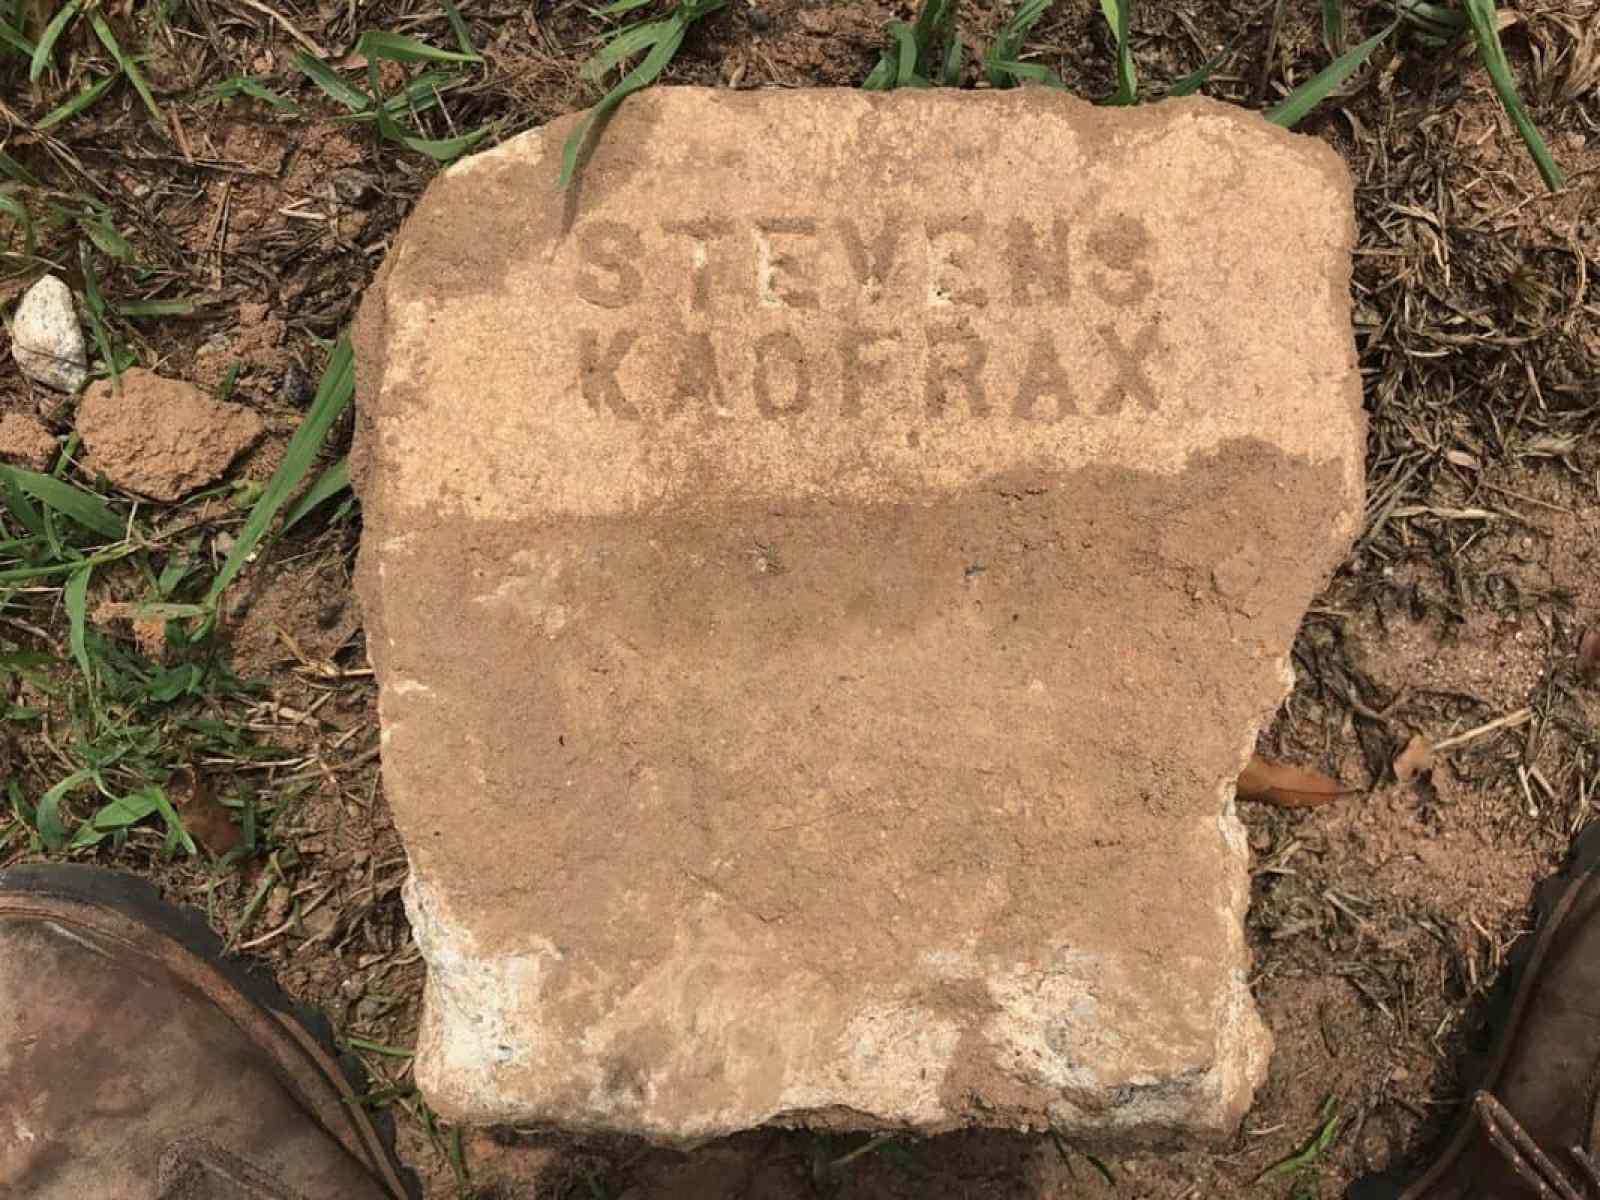 dad's house clay maker stevens kaofrax